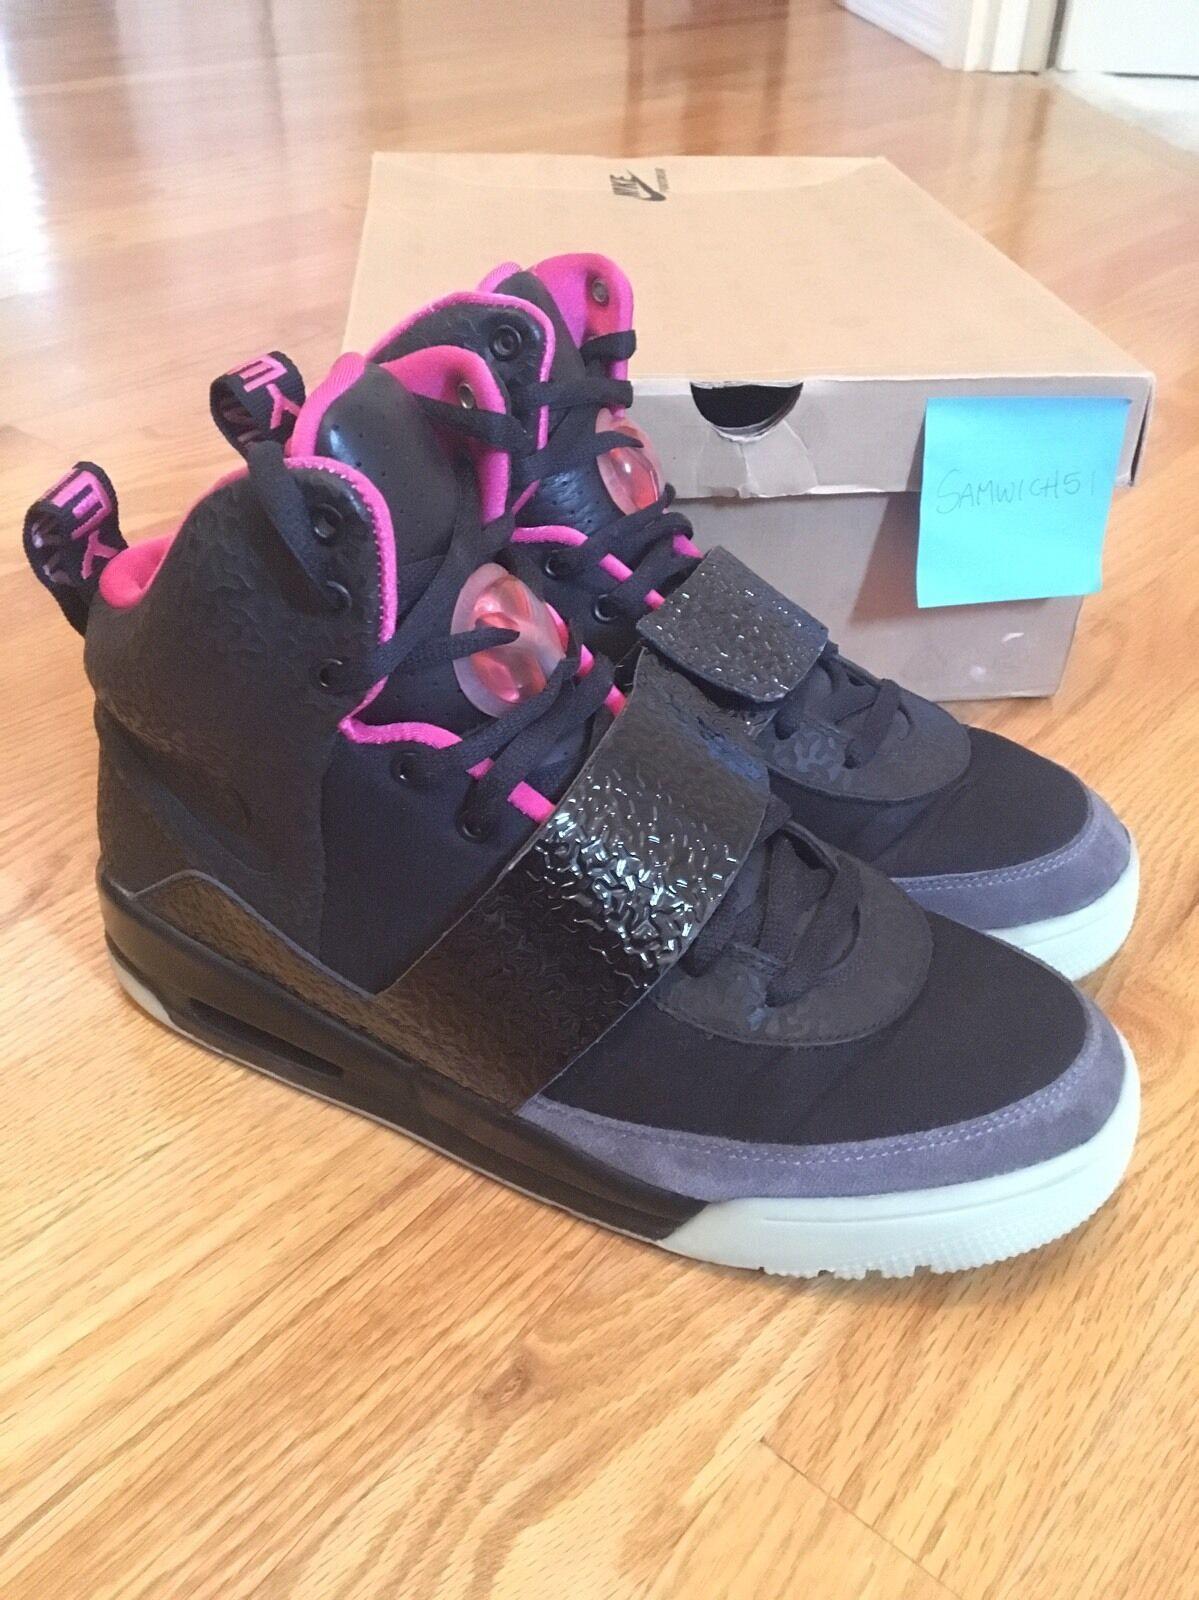 2009 Air Yeezy 1 Blink Black Pink Kanye West Size 11